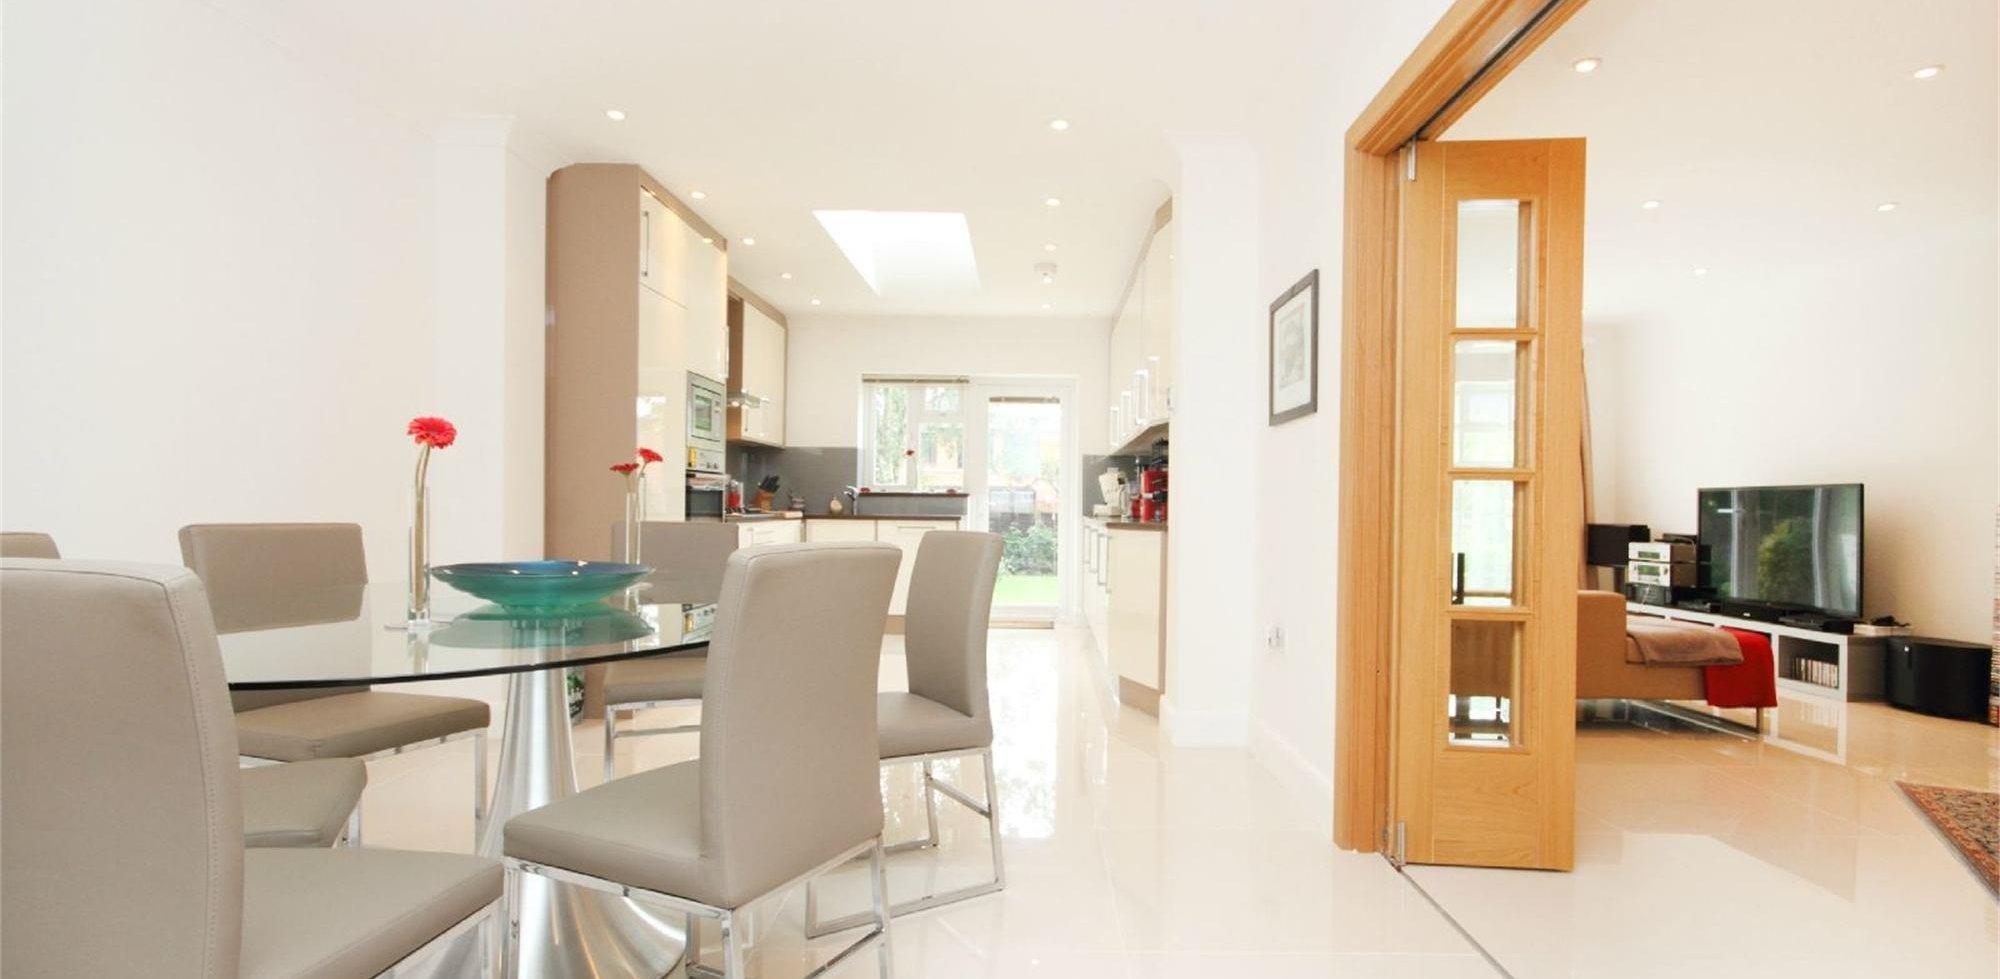 Rent Room Ealing London